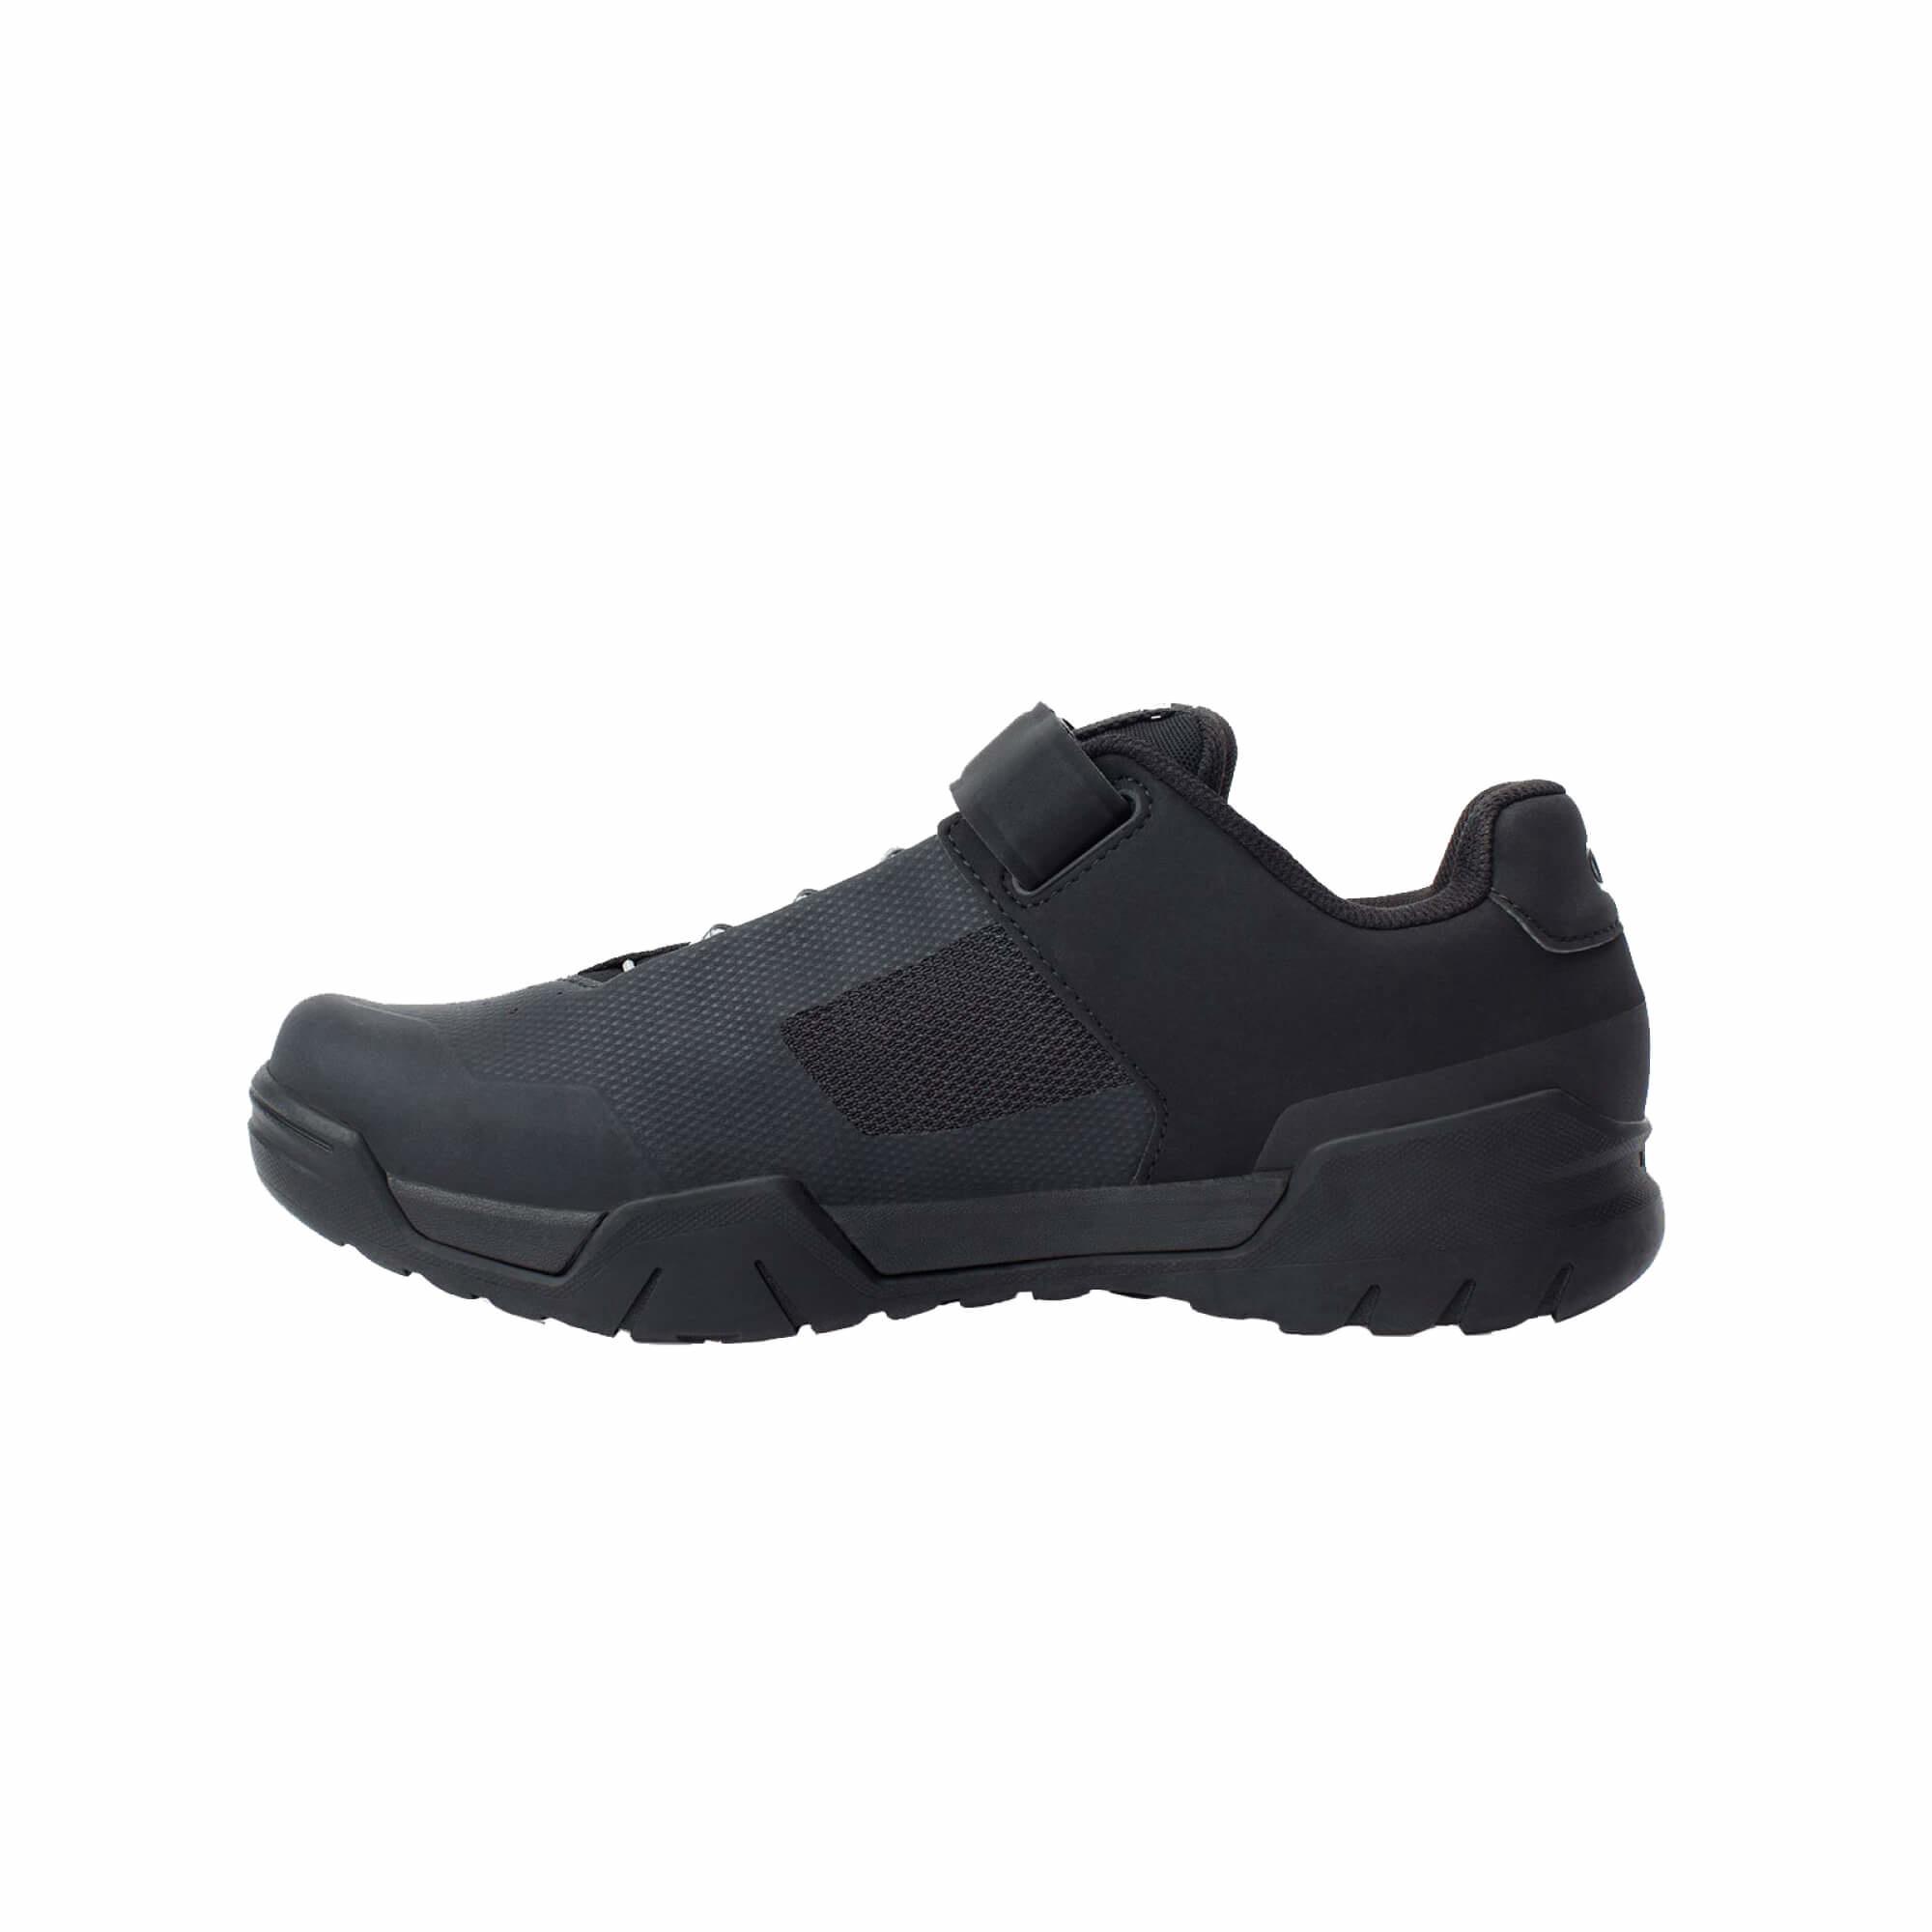 Shoes Mallet Speedlace Clipless Spd-2